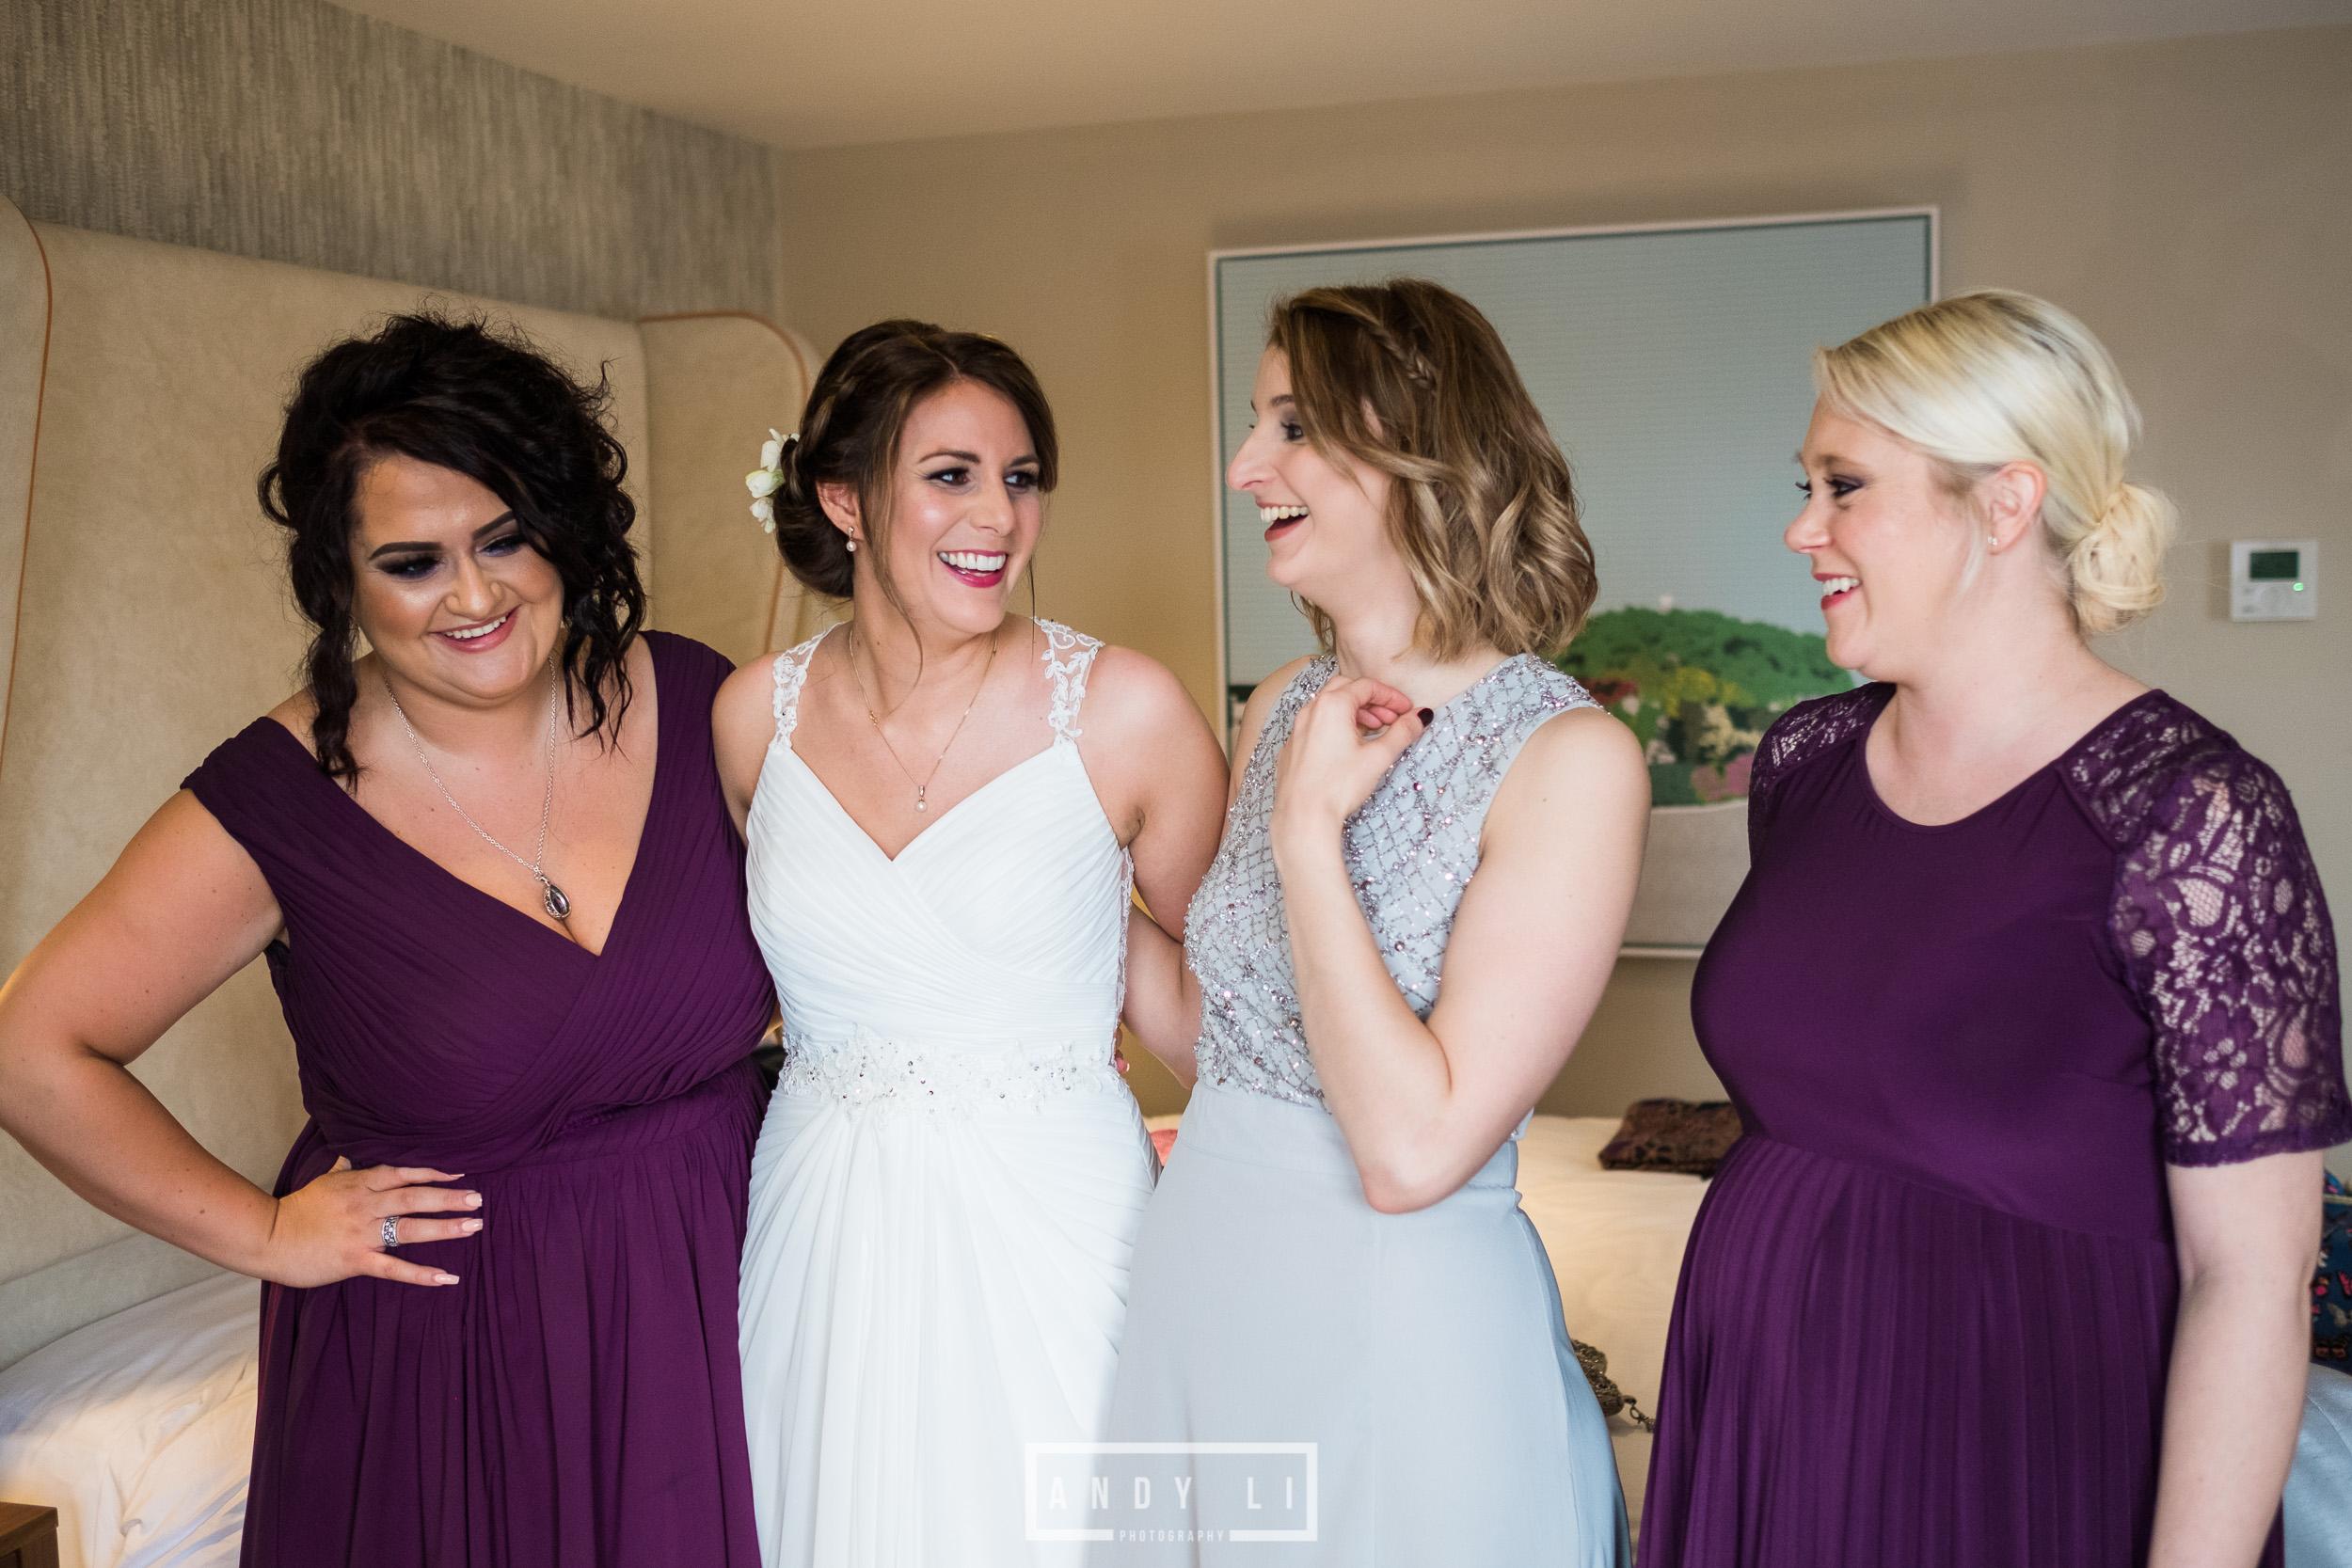 Belle Epoque Wedding Photographer-002-DSCF6825.jpg